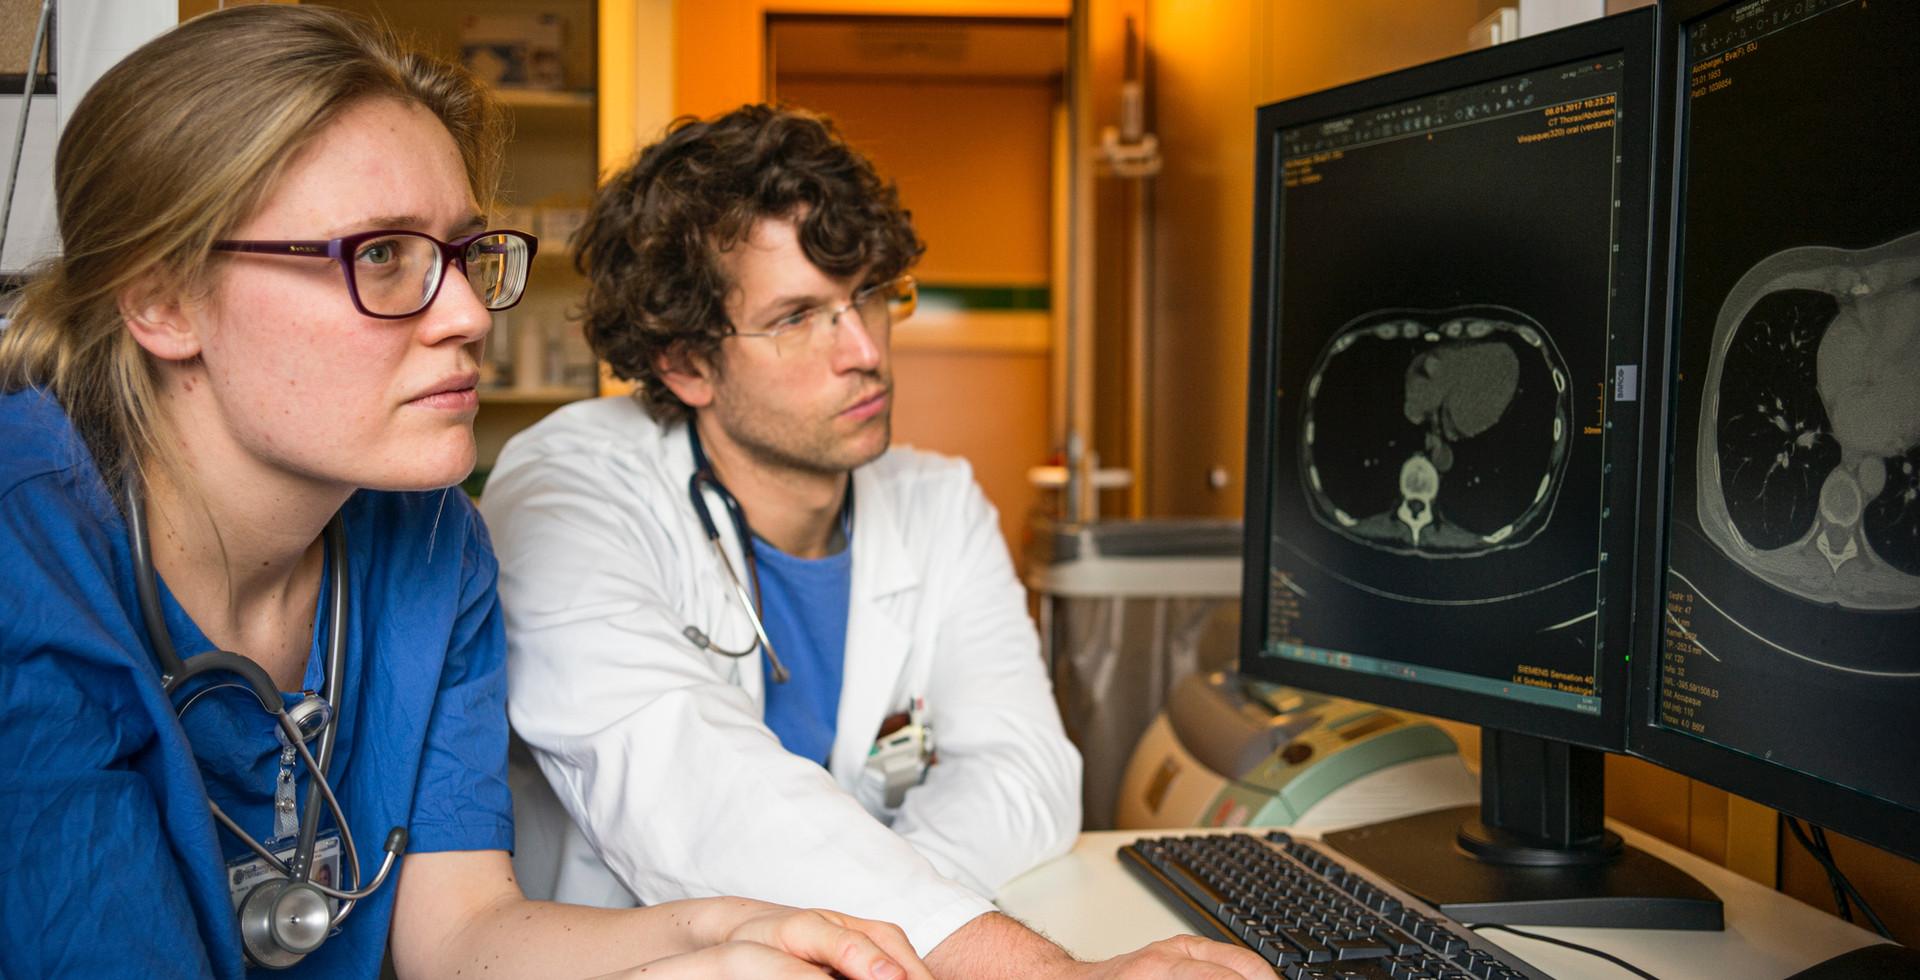 Radiology Jeopardy